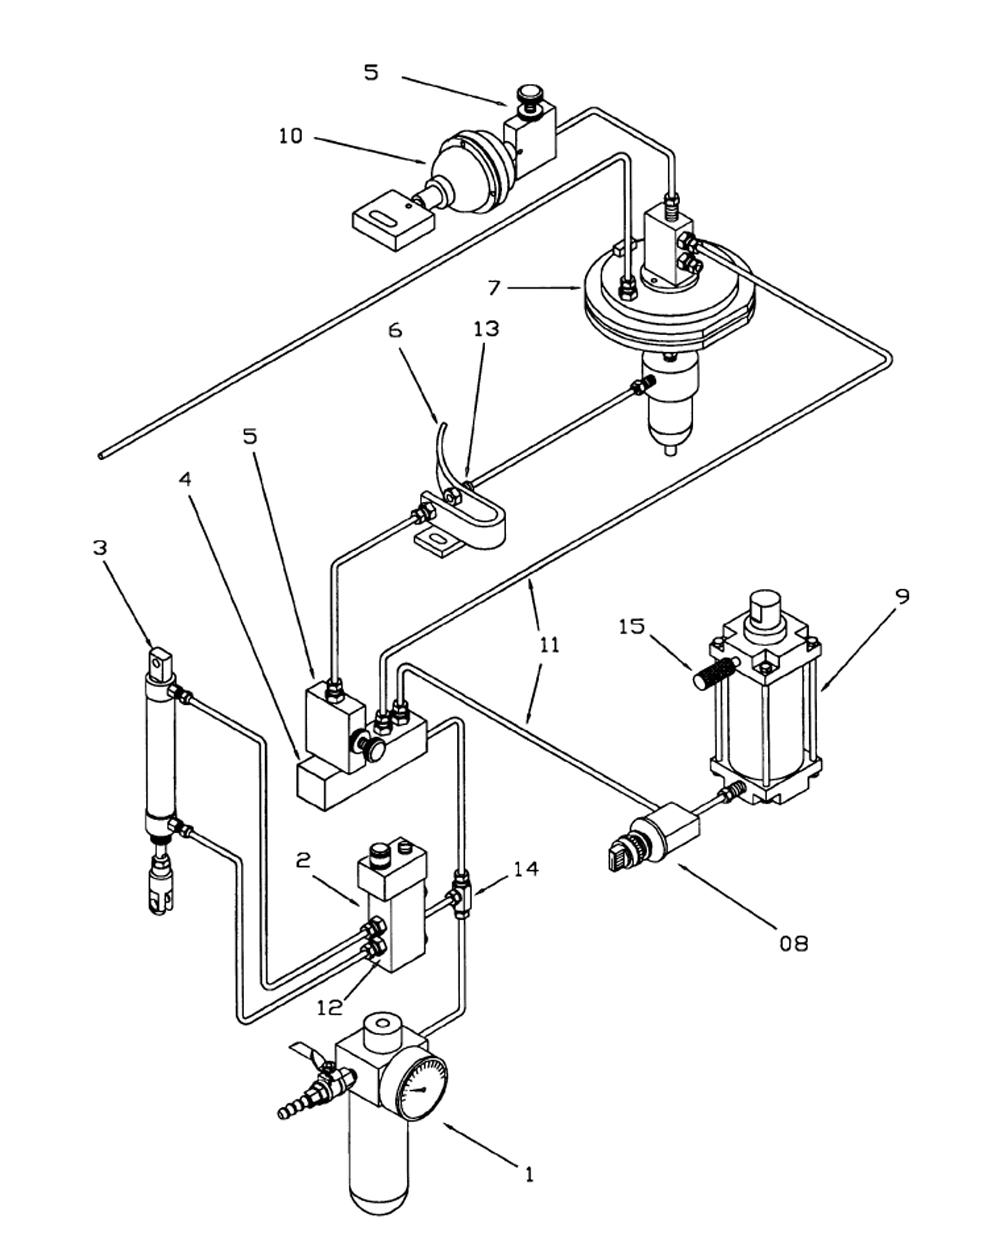 ingersoll rand 375 air compressor wiring diagram